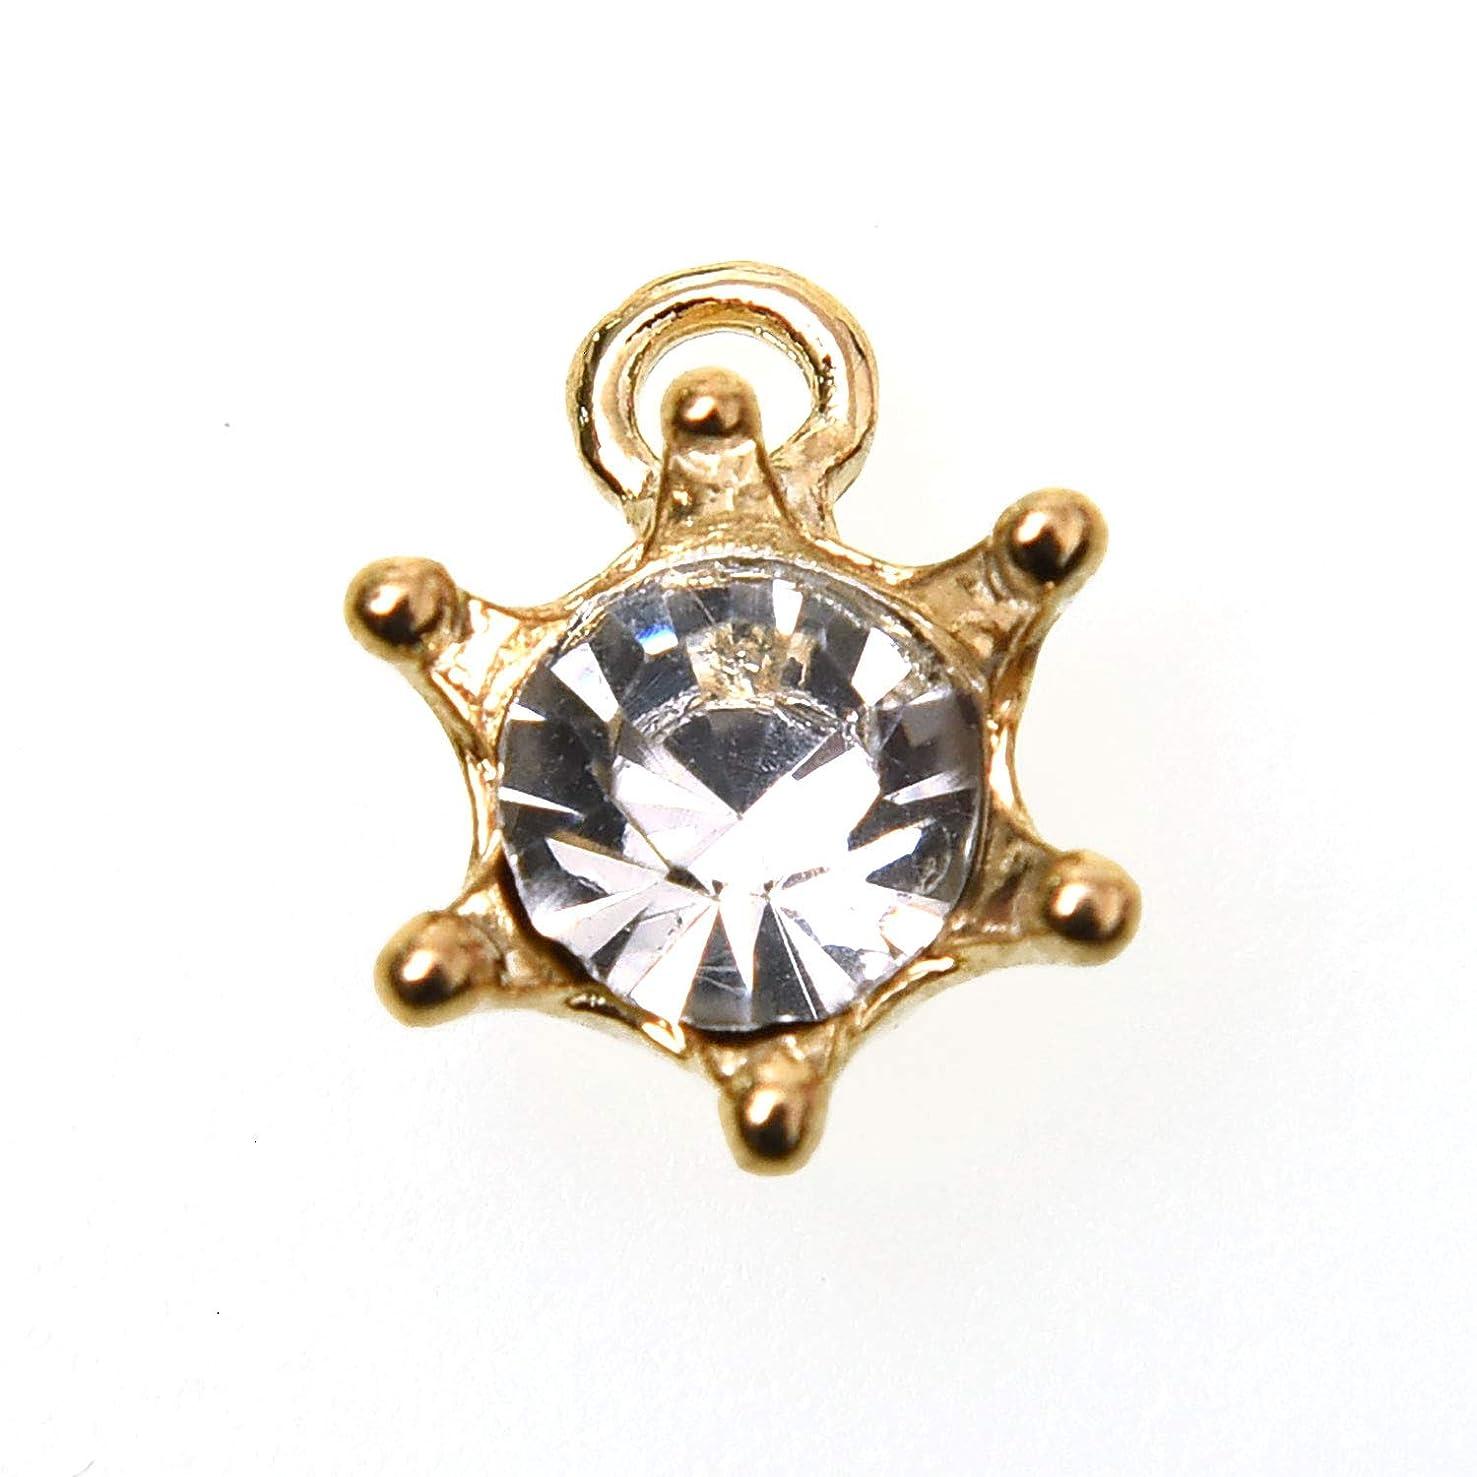 Monrocco 100 pcs Cute Crystal Gold Crown Rhinestone Jewelry Pendant Charms